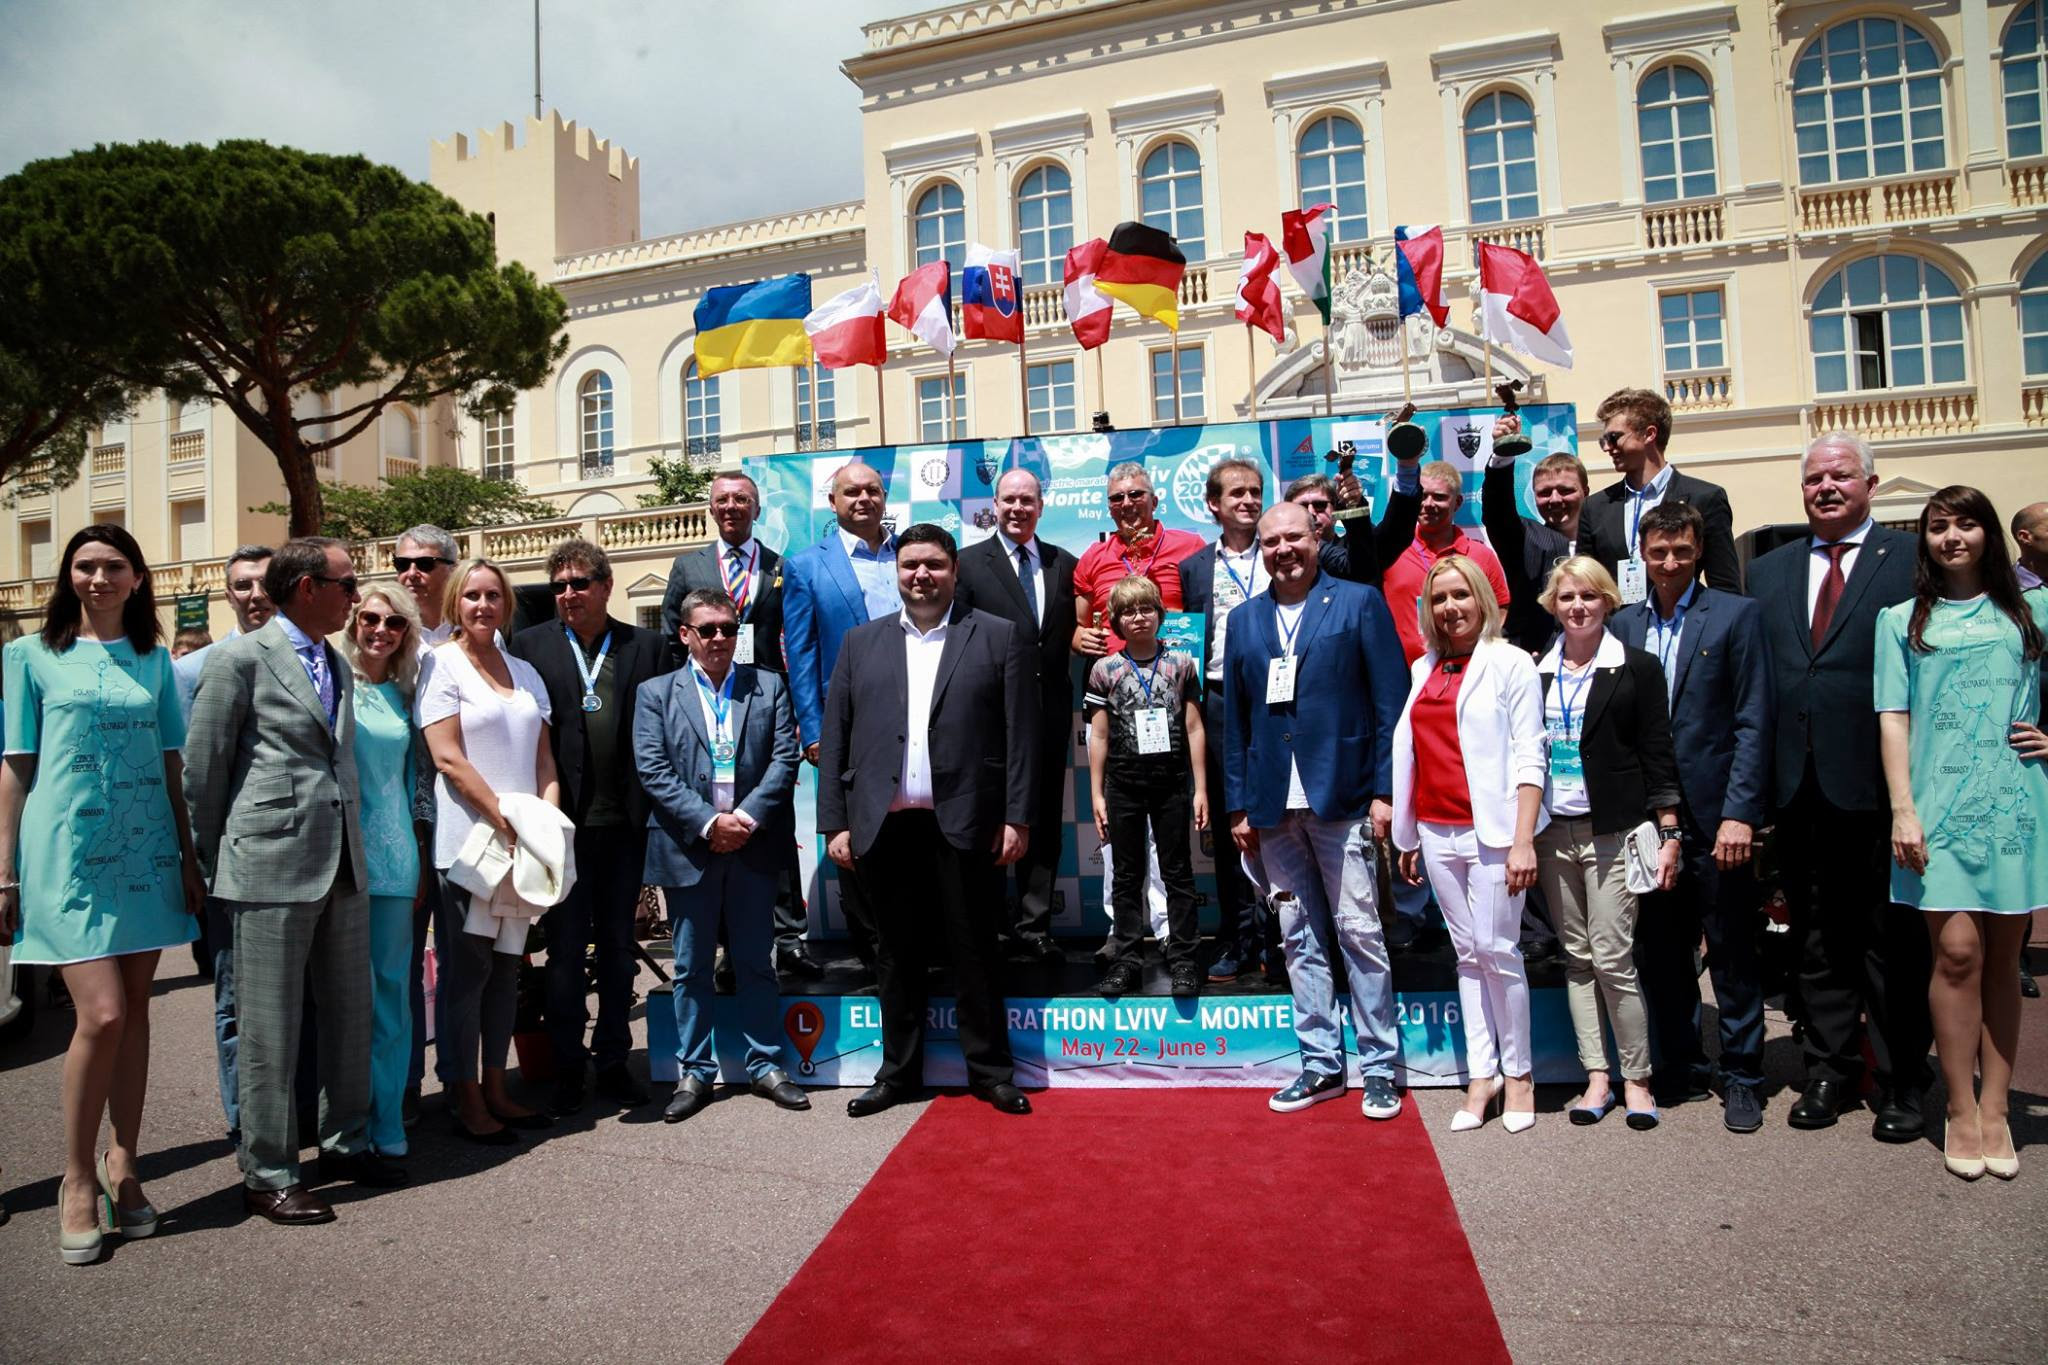 Украина взяла номинацию «Plug-In гибриды» в Монако